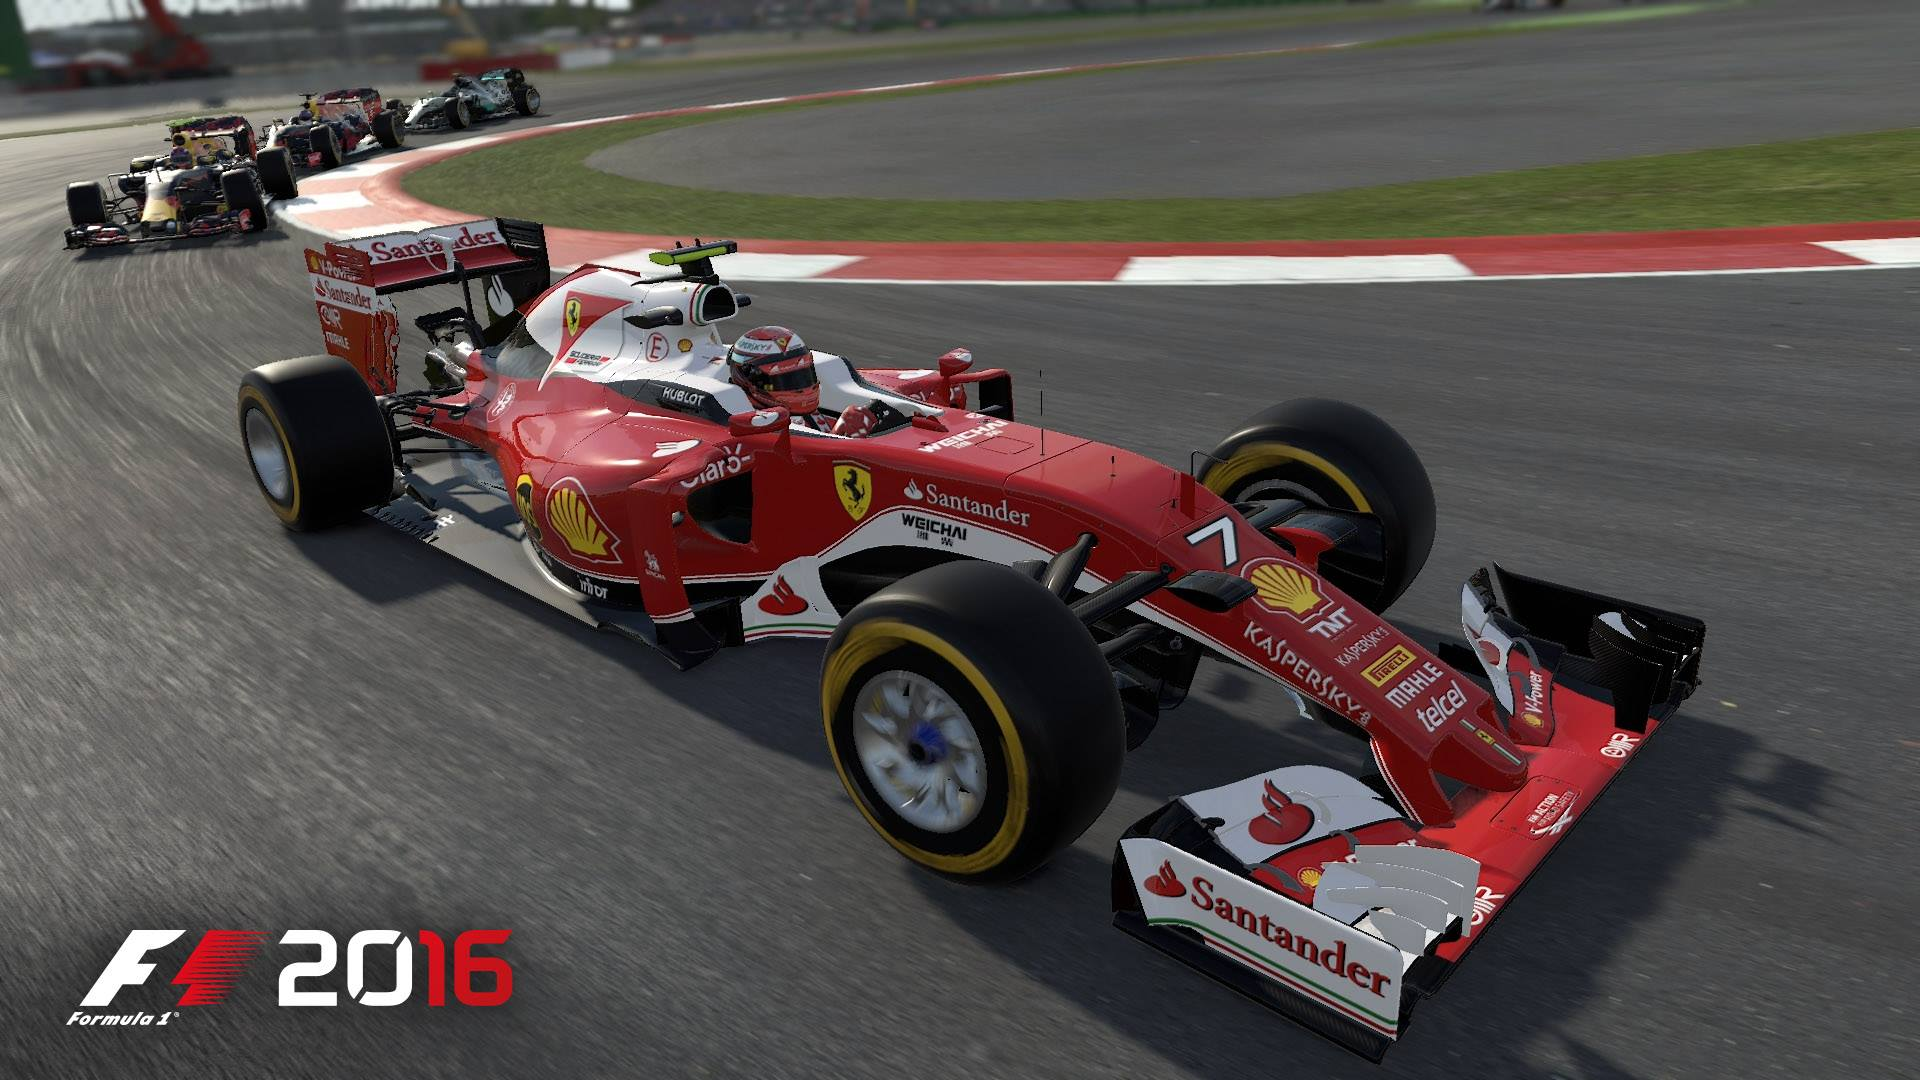 f1 2016 new previews sim racing news. Black Bedroom Furniture Sets. Home Design Ideas